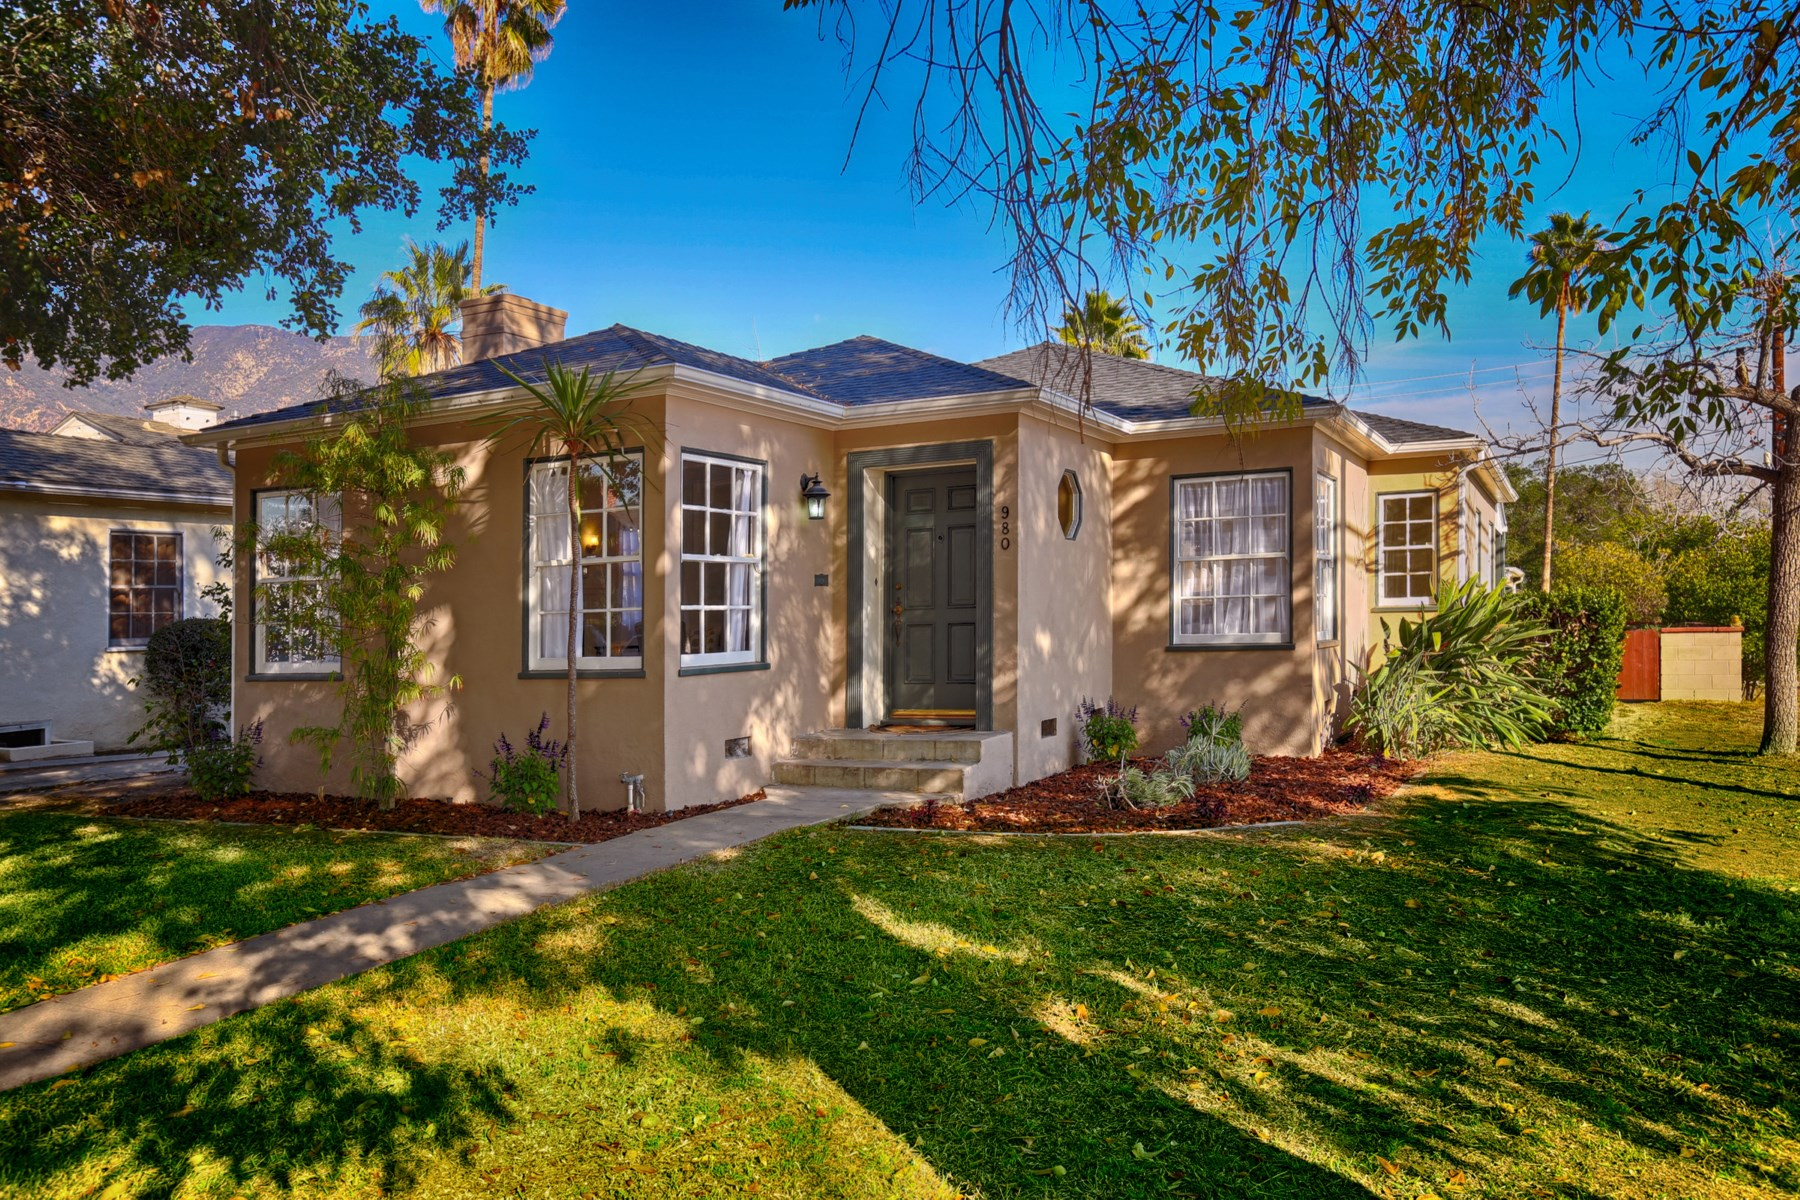 Single Family Home for Sale at Vintage Pasadena Style 980 North Vinedo Avenue Pasadena, California 91107 United States